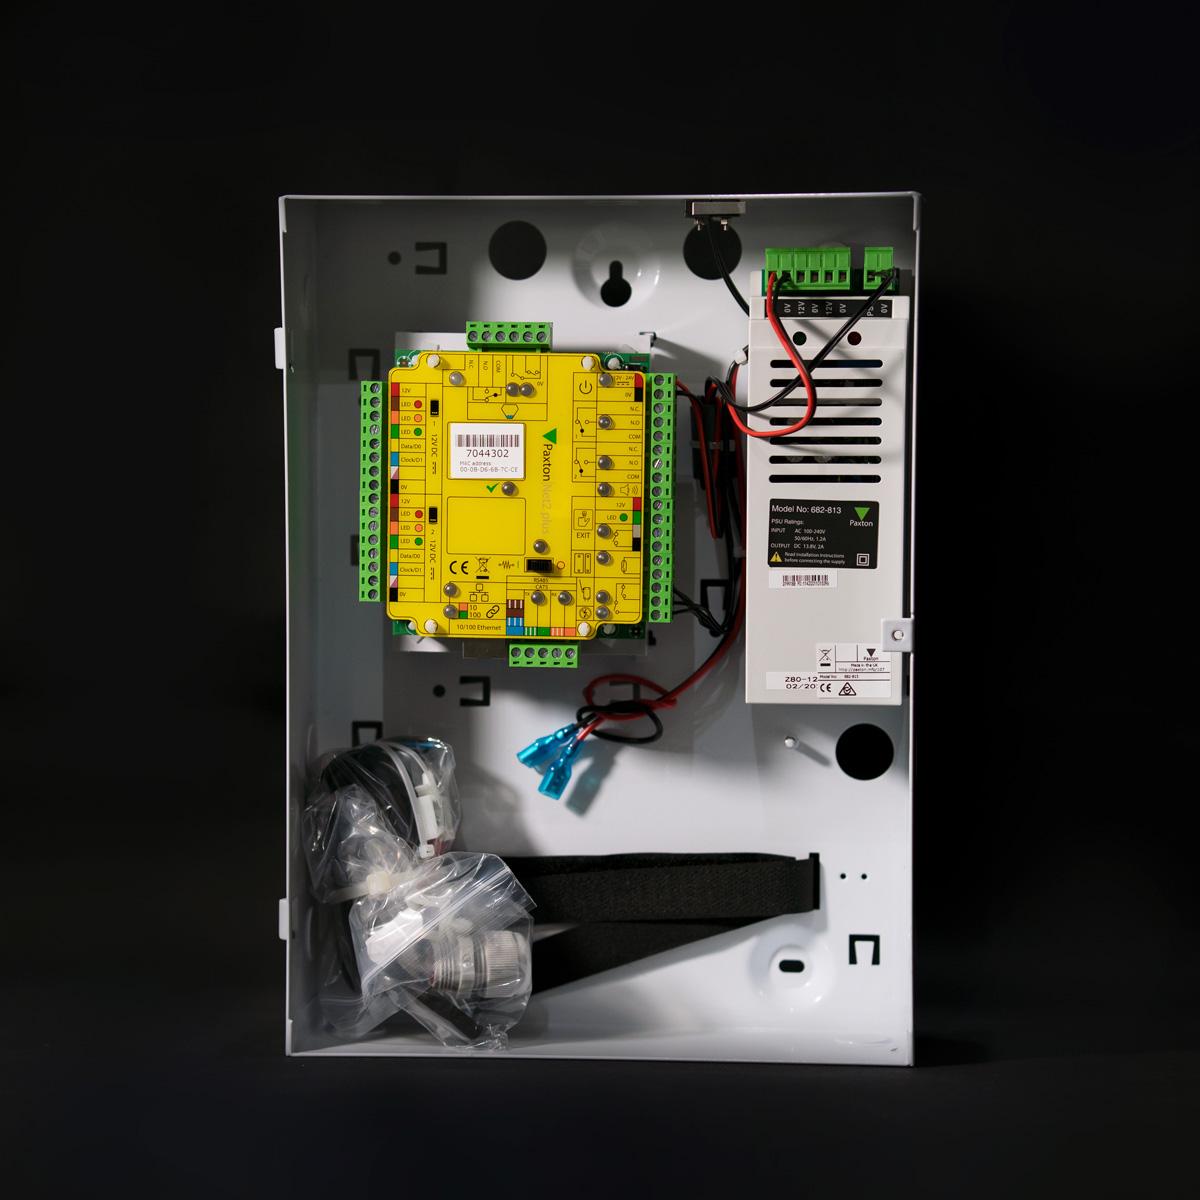 Paxton-Net2-plus-1-door-controller-–-12V-2A-PSU-Metal-cabinet-682-813-EX